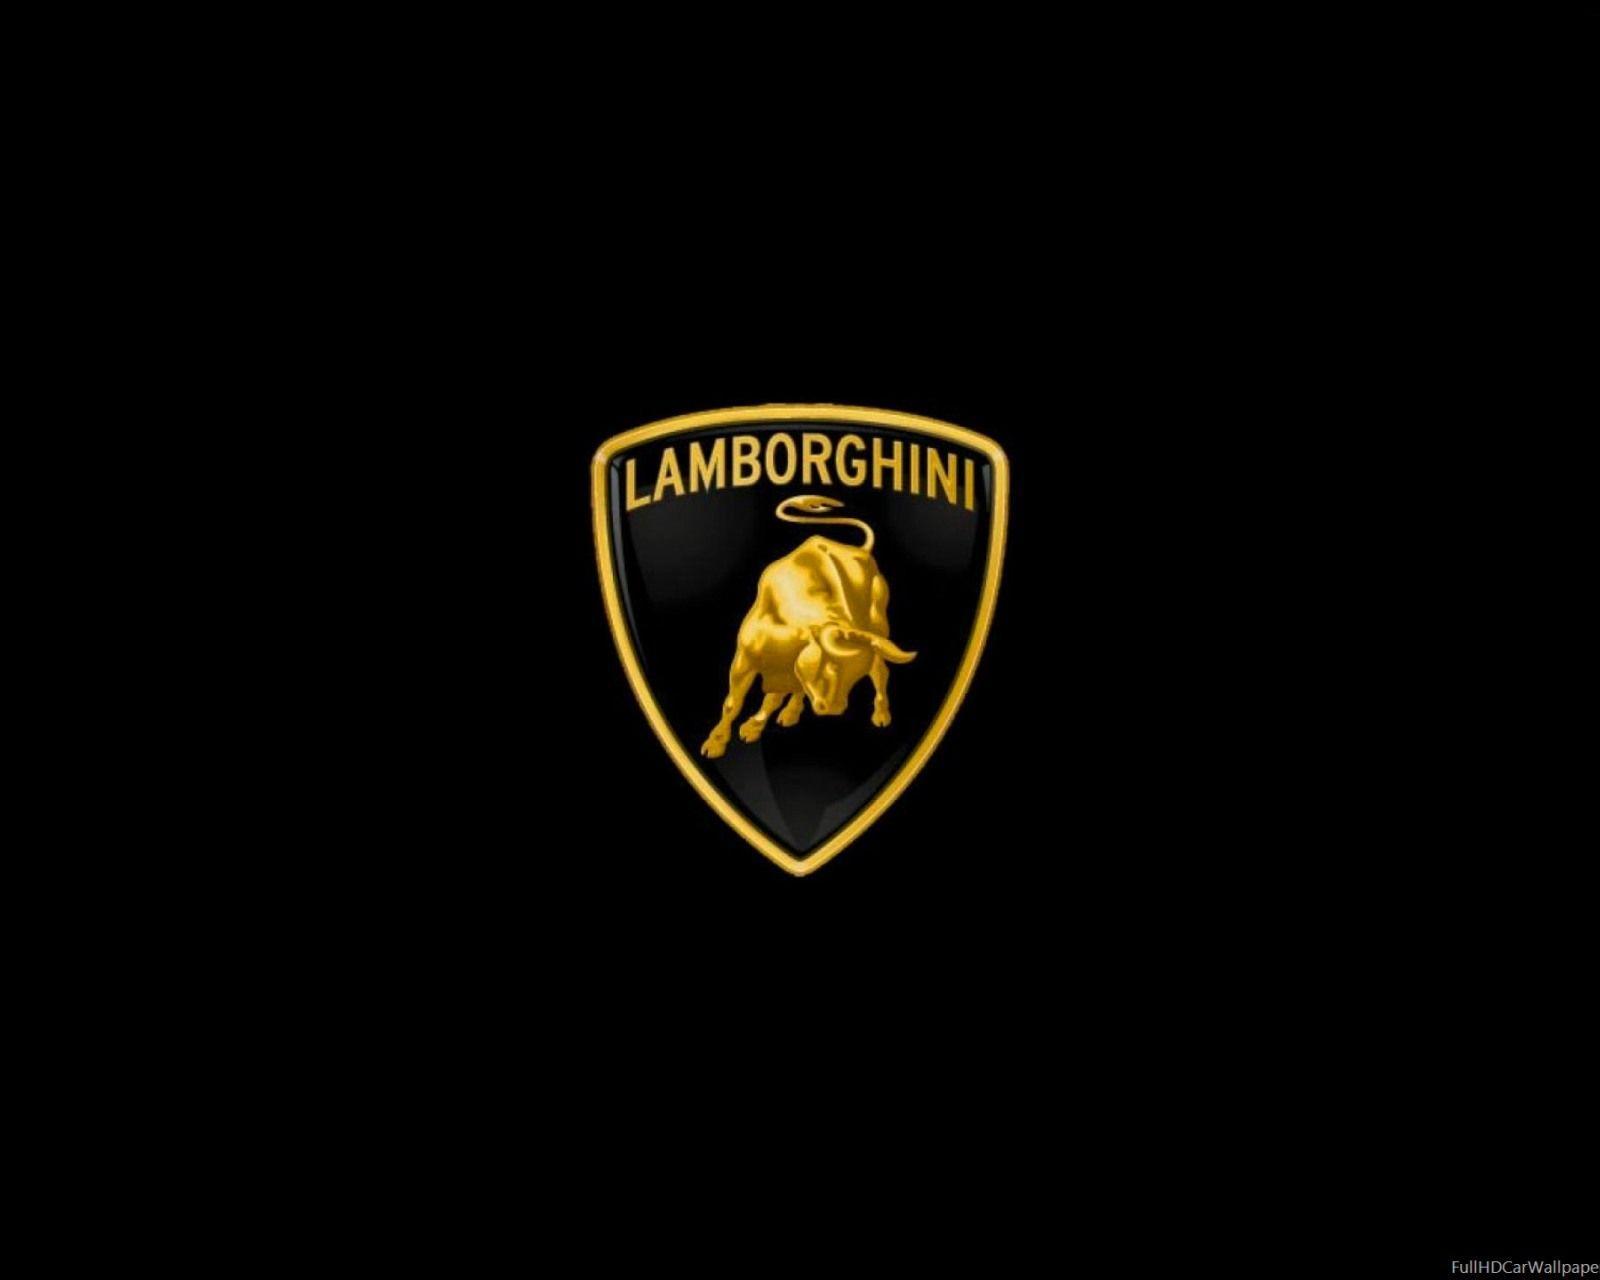 Lamborghini Logo 30552 Hd Wallpapers In Logos  Telusers